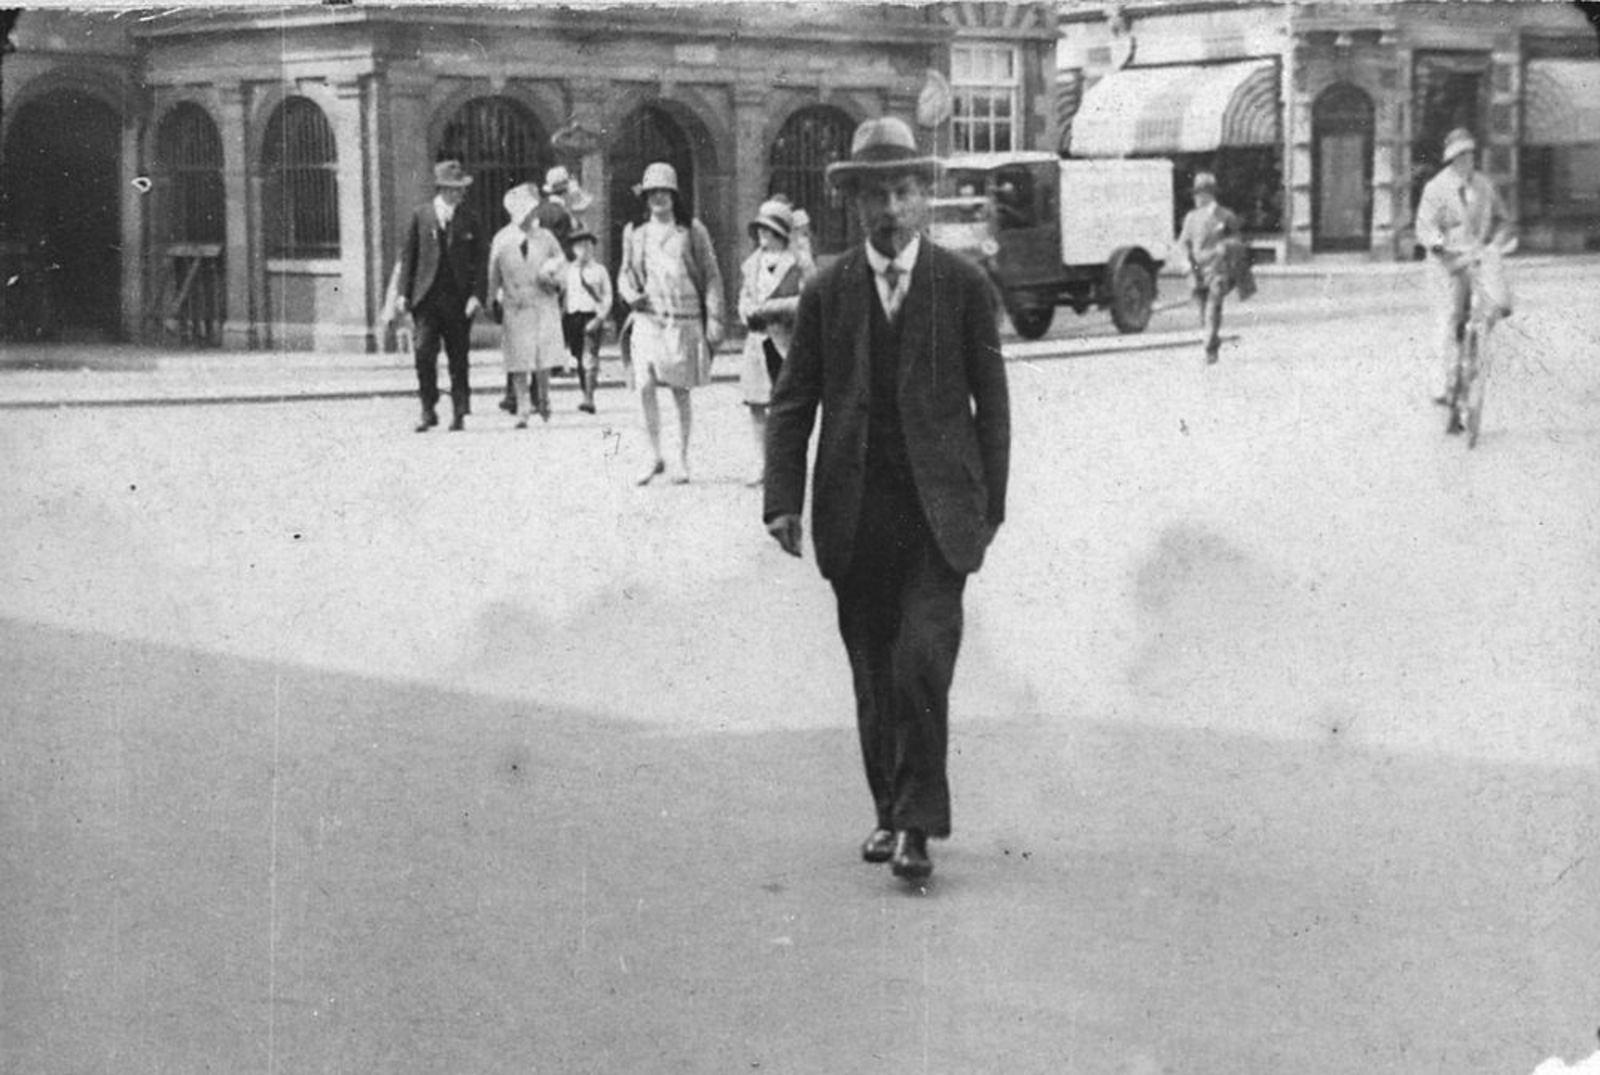 Onbekend Man 19__ in de Stad bij Station oid